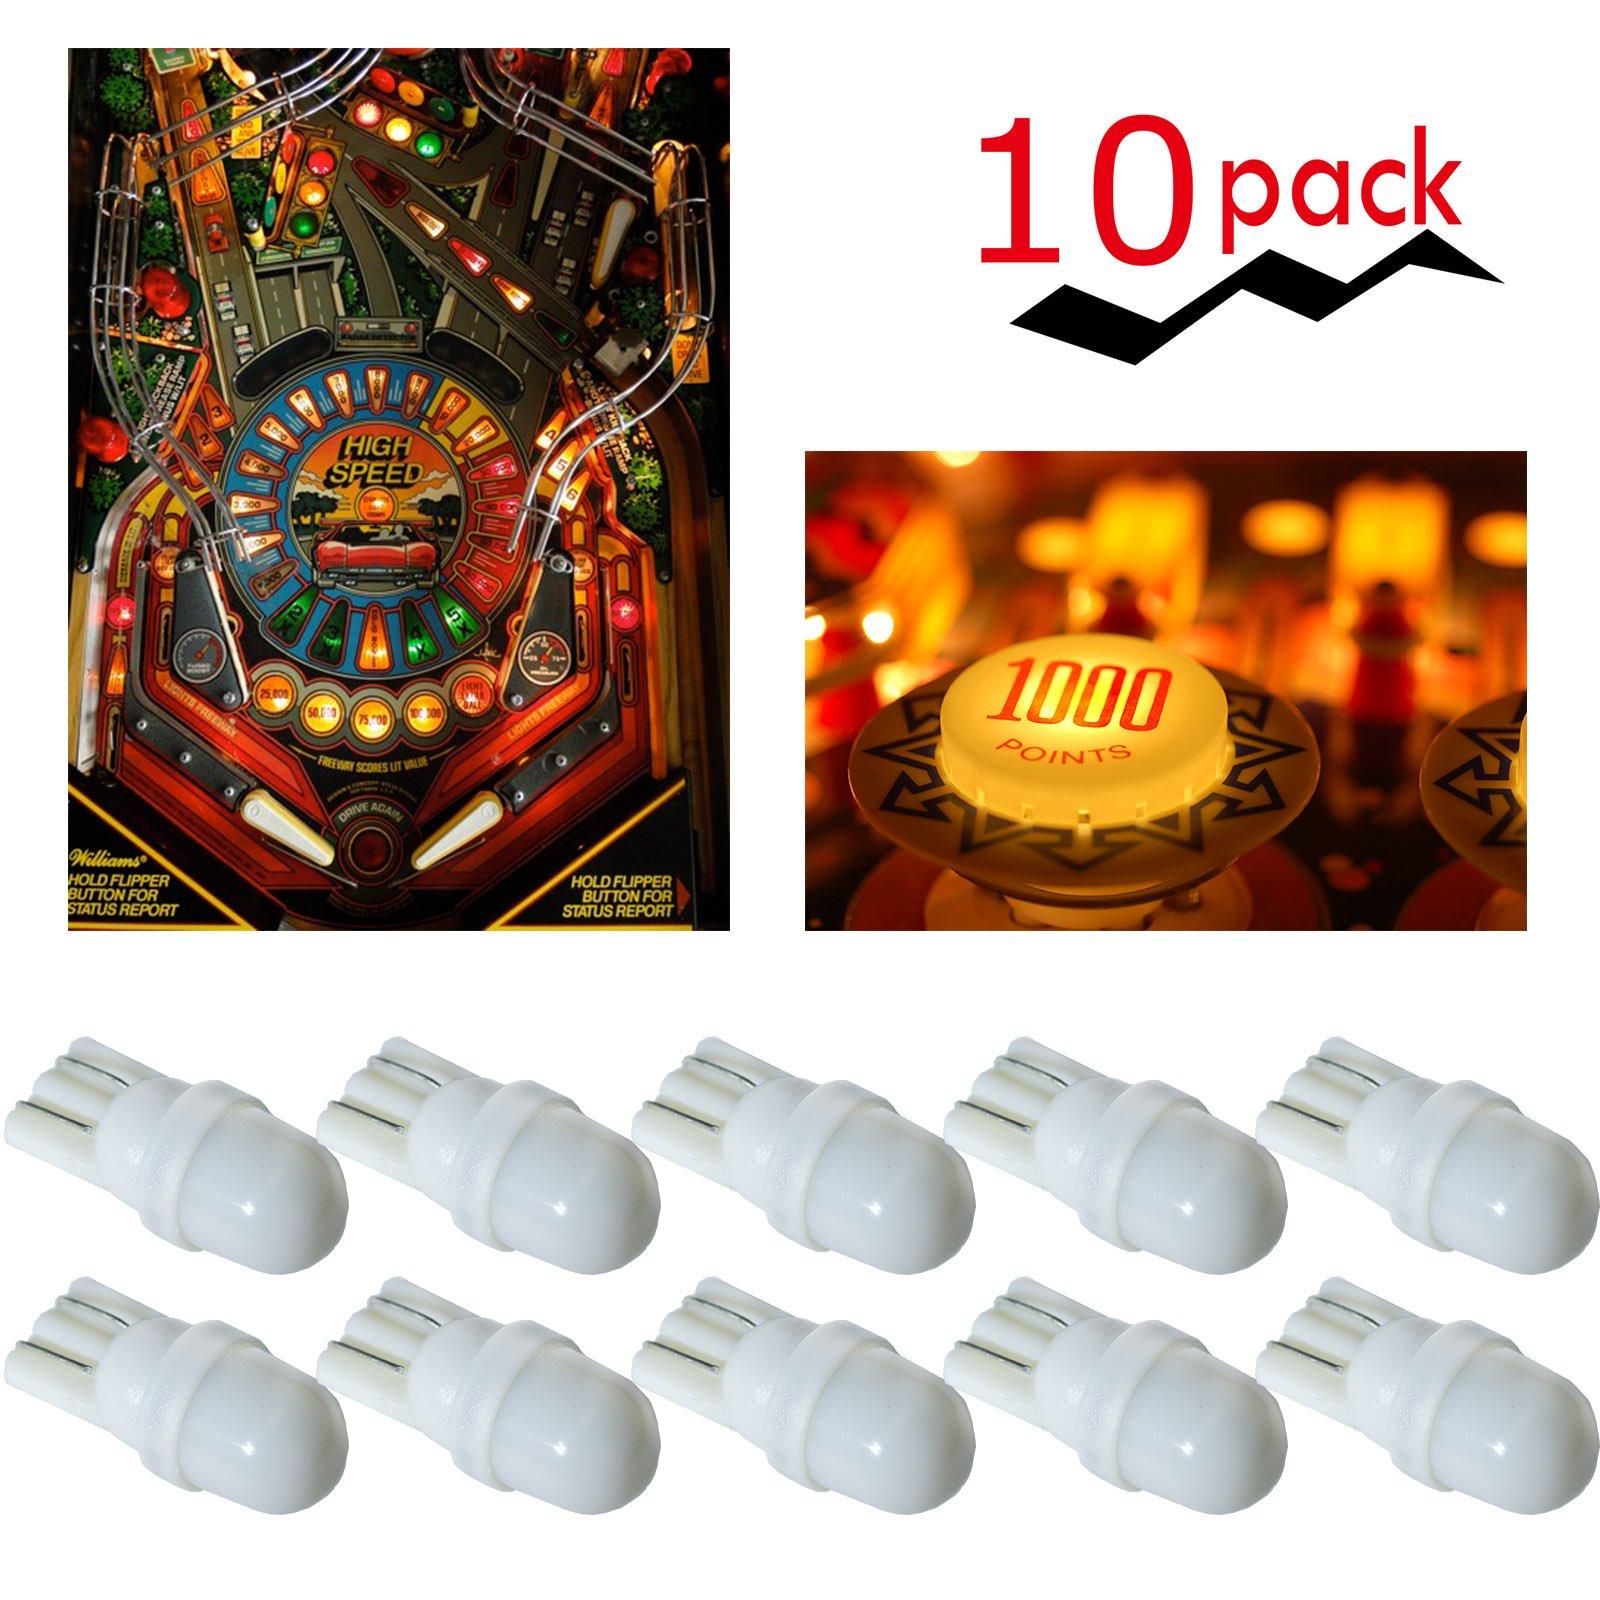 PA 10PCS #44 #47 #1893 #756 #1847 T10 w5w 2 SMD 2835 LED Wedge Pinball Machine Light Top View Bulb 6.3VDC (White) by PA